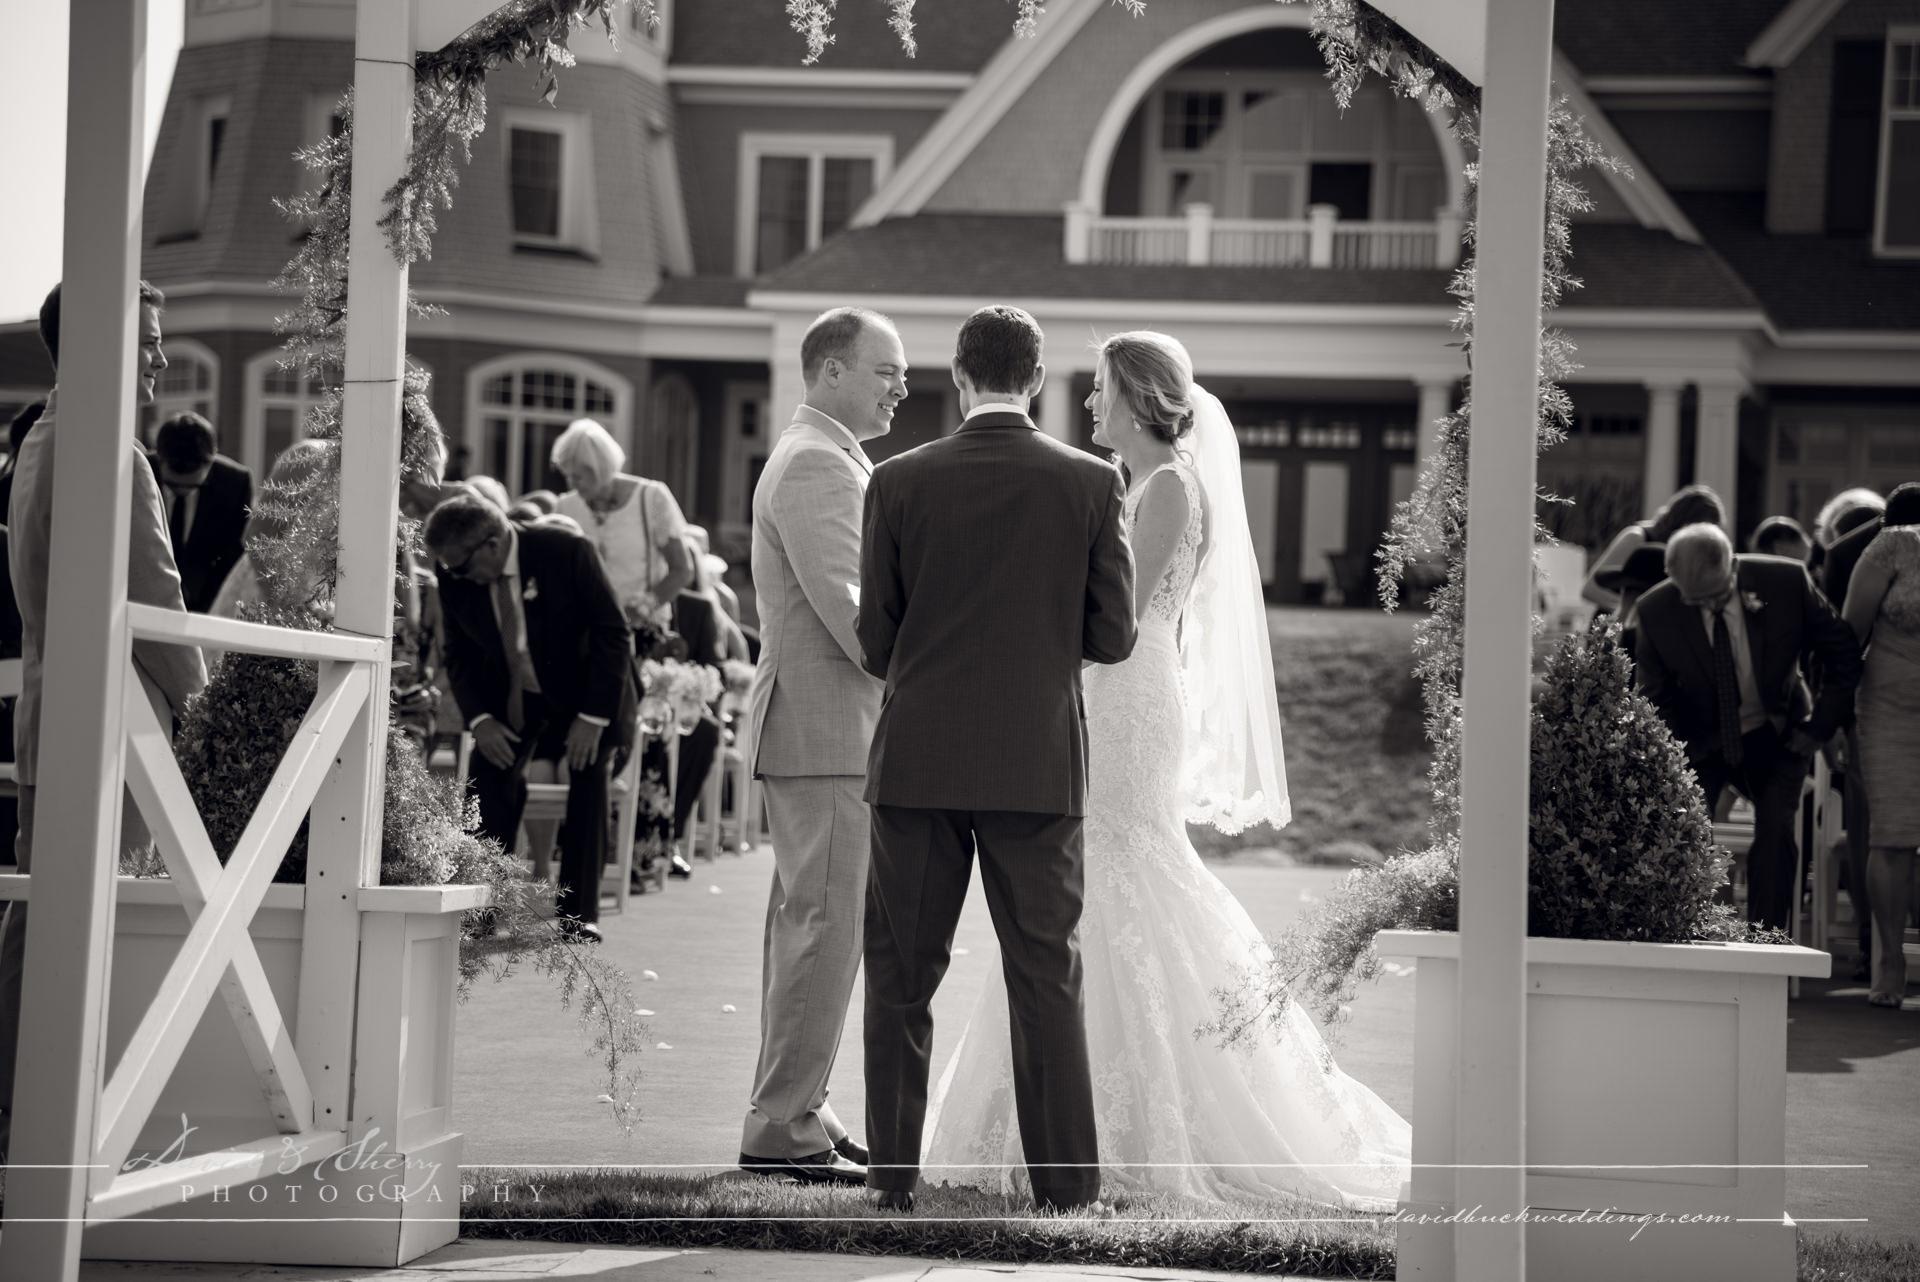 Cobble_Beach_Wedding_Photography_Owen_Sound_23